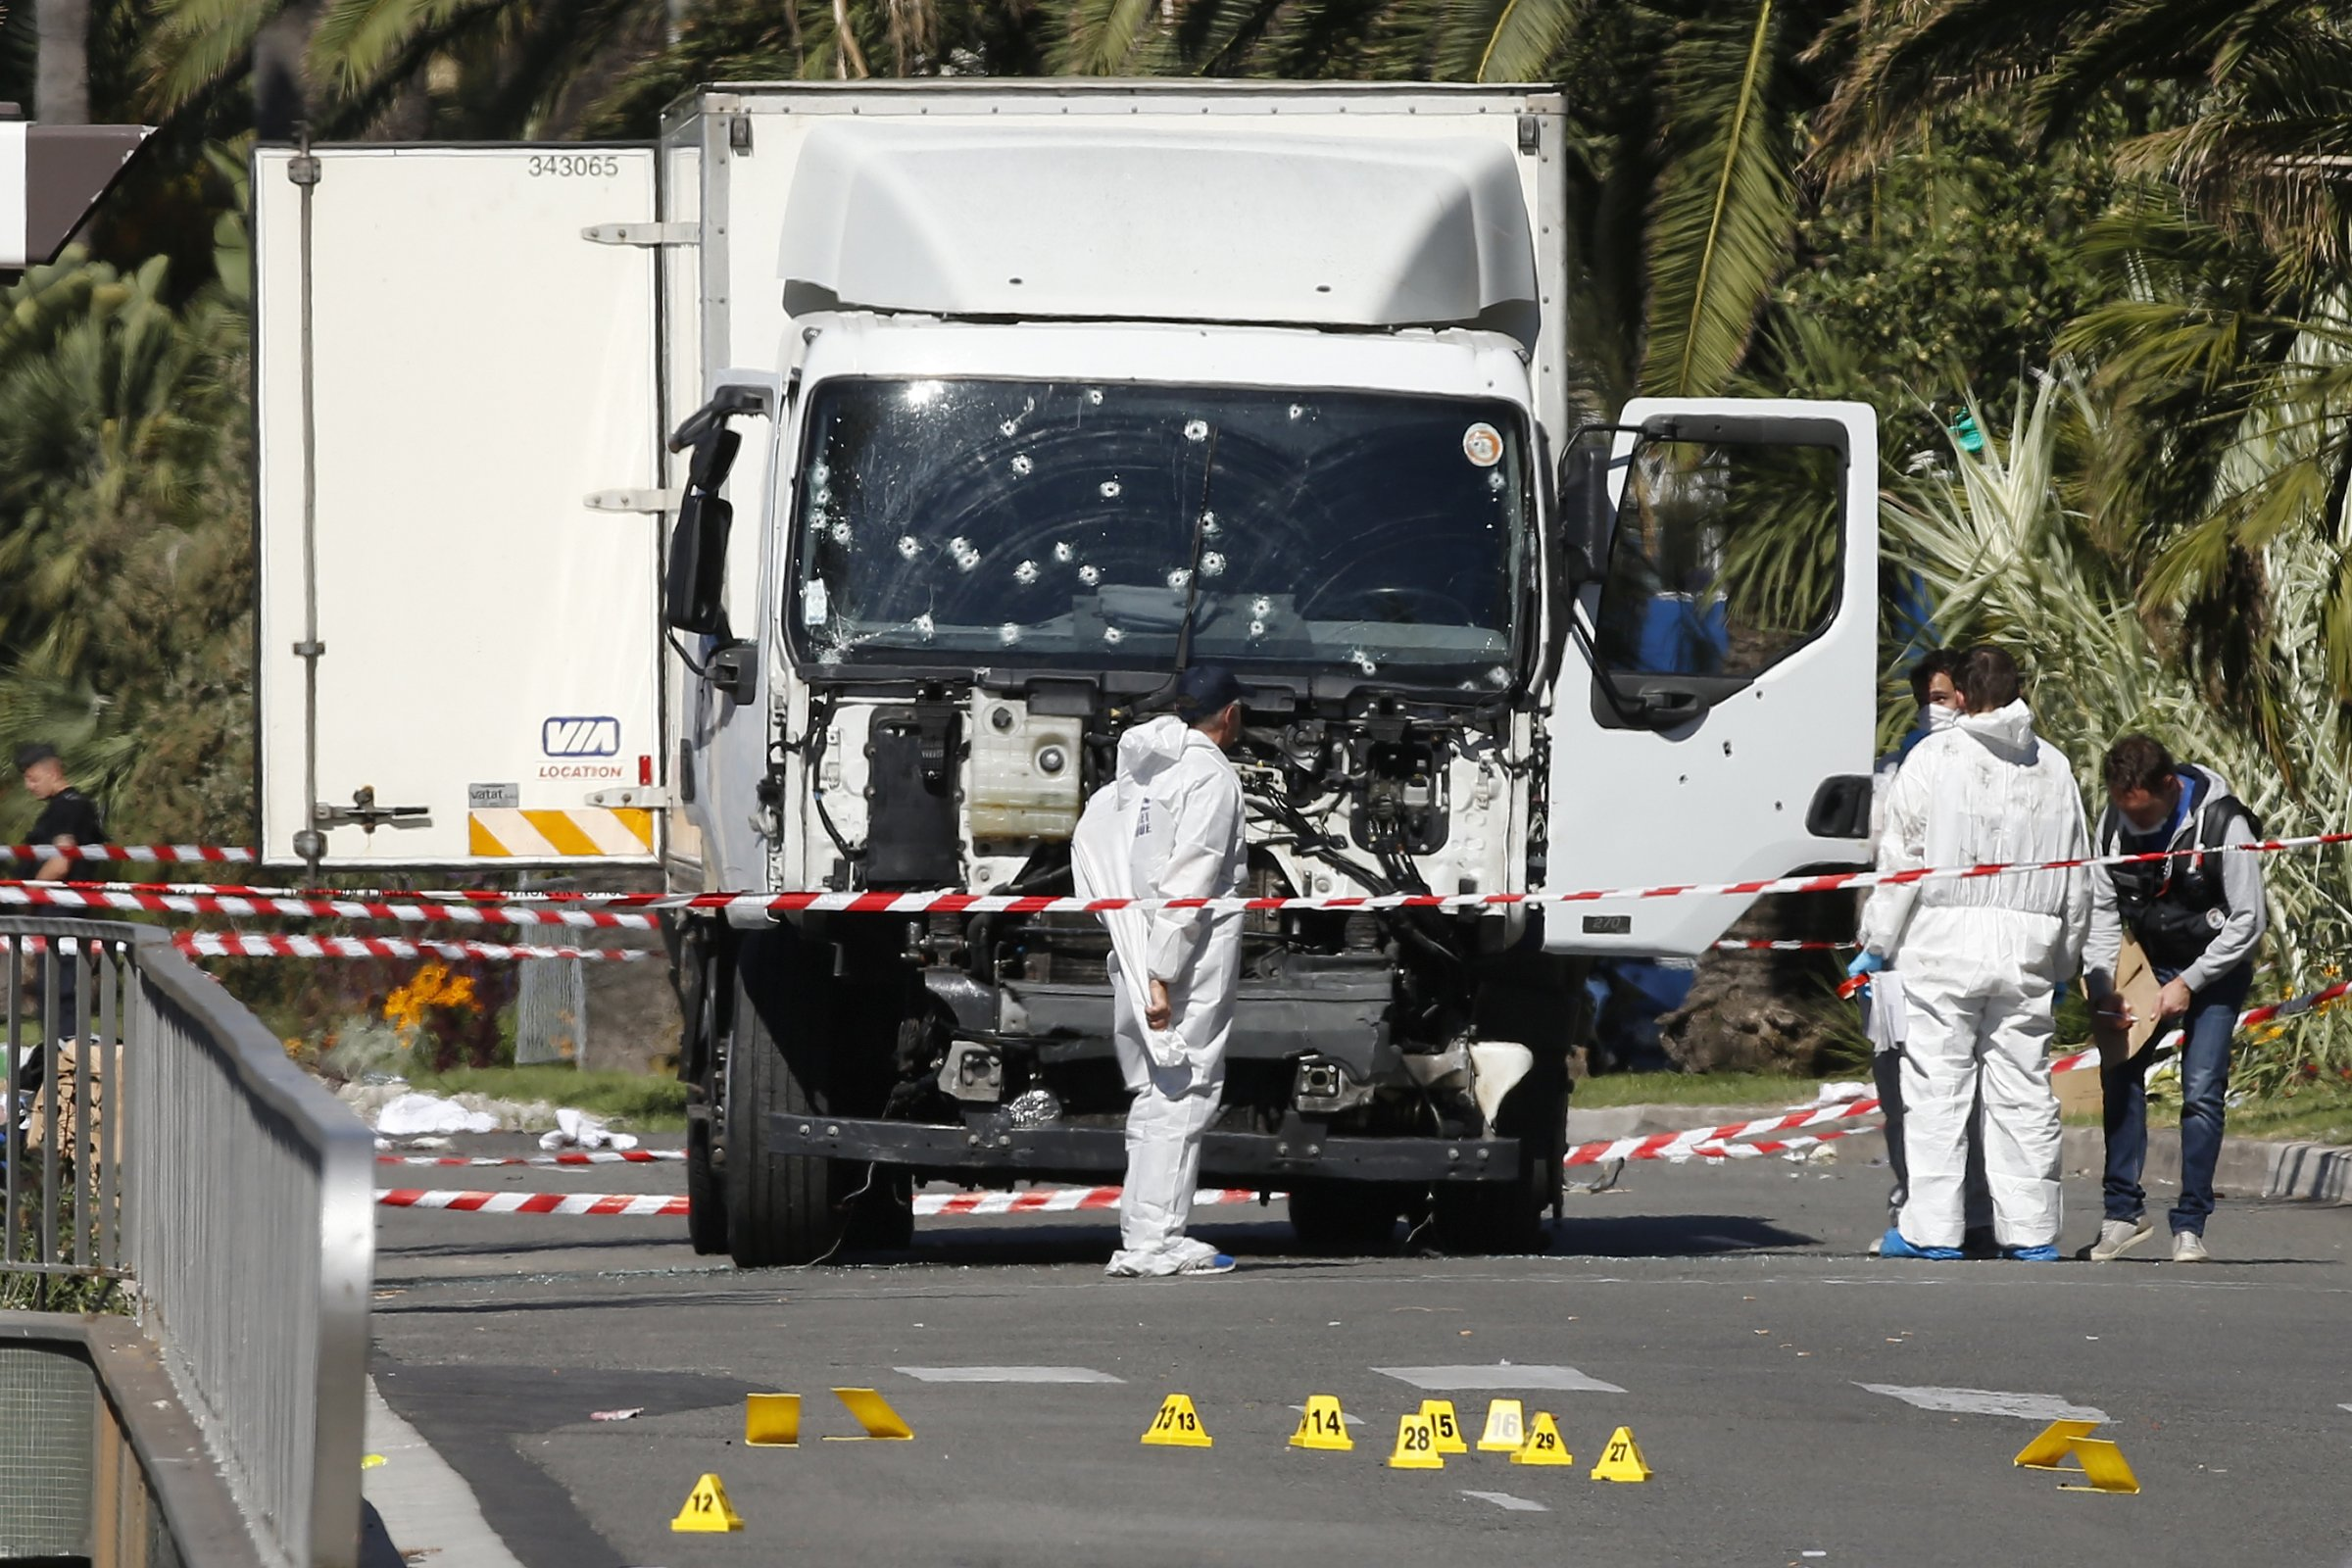 Nice attack truck